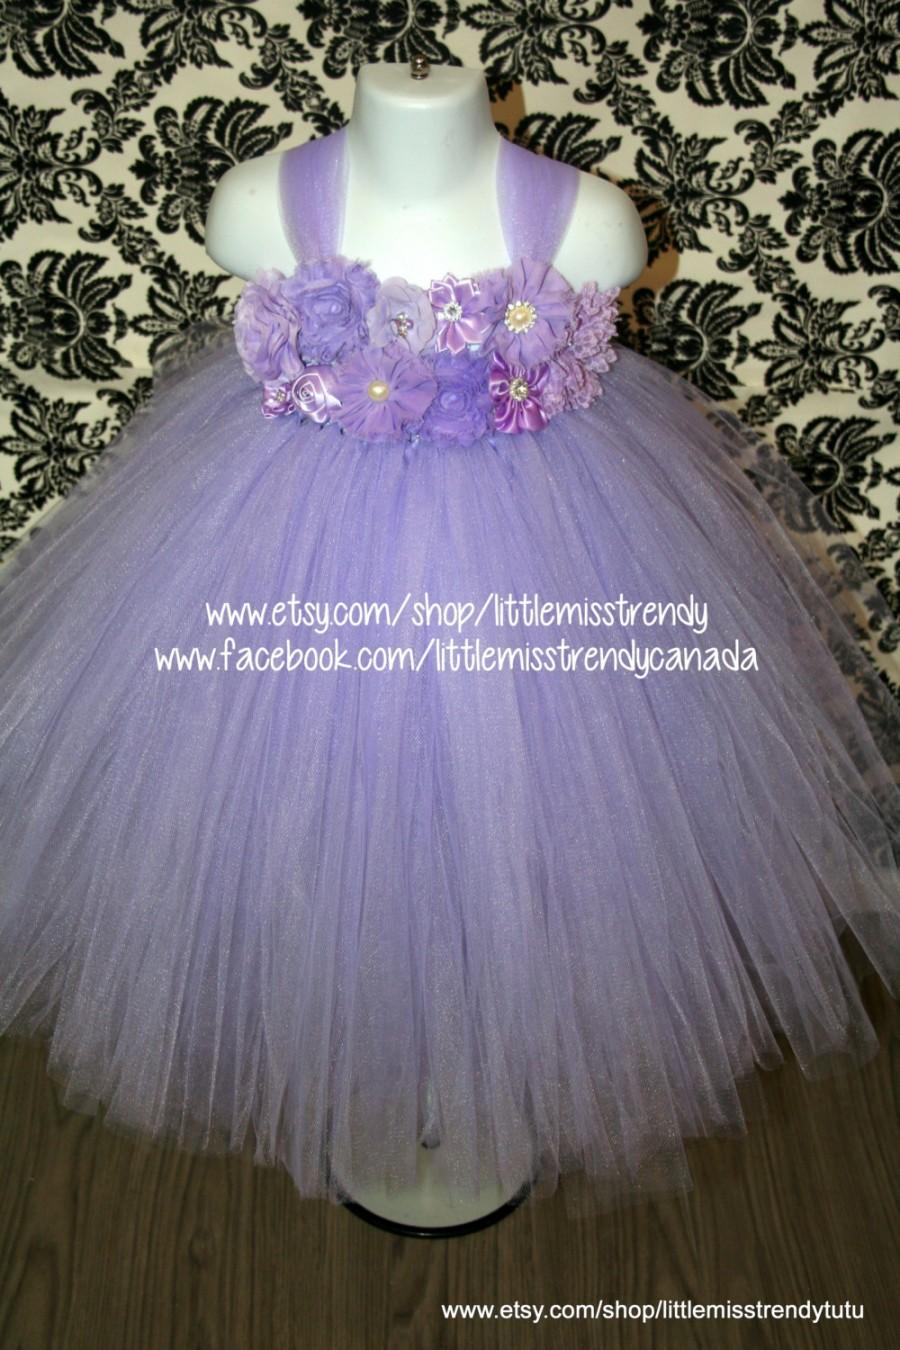 Свадьба - Lilac Flower Girl Dress, Lilac Tutu Dress, Lavender Tutu Dress,Light Purple Couture Tutu Dress, Lilac Couture Flower Girl Dress, Flower Girl